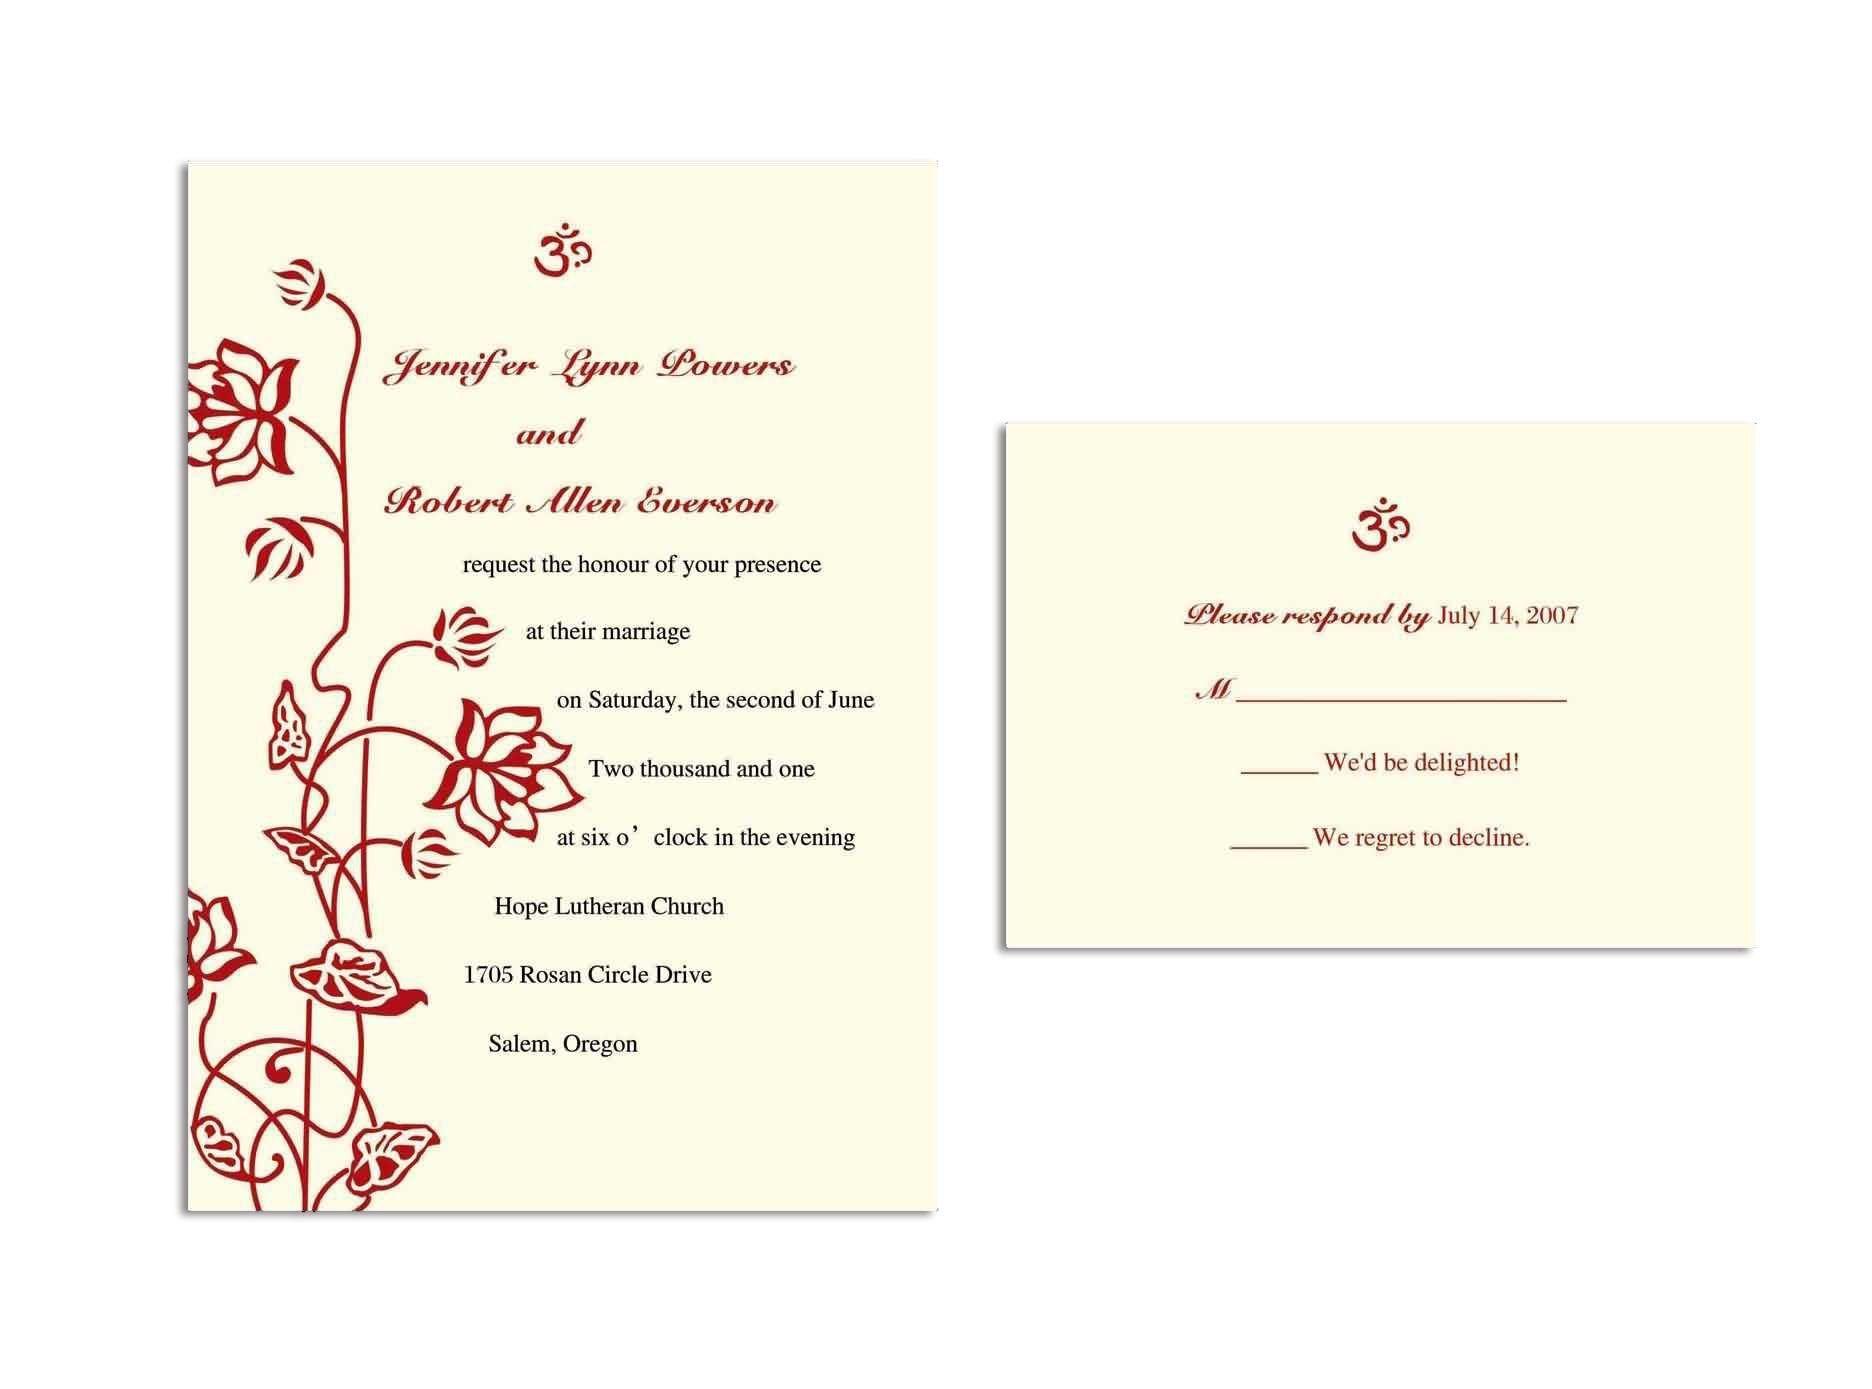 wedding invitation response card wedding invitation response